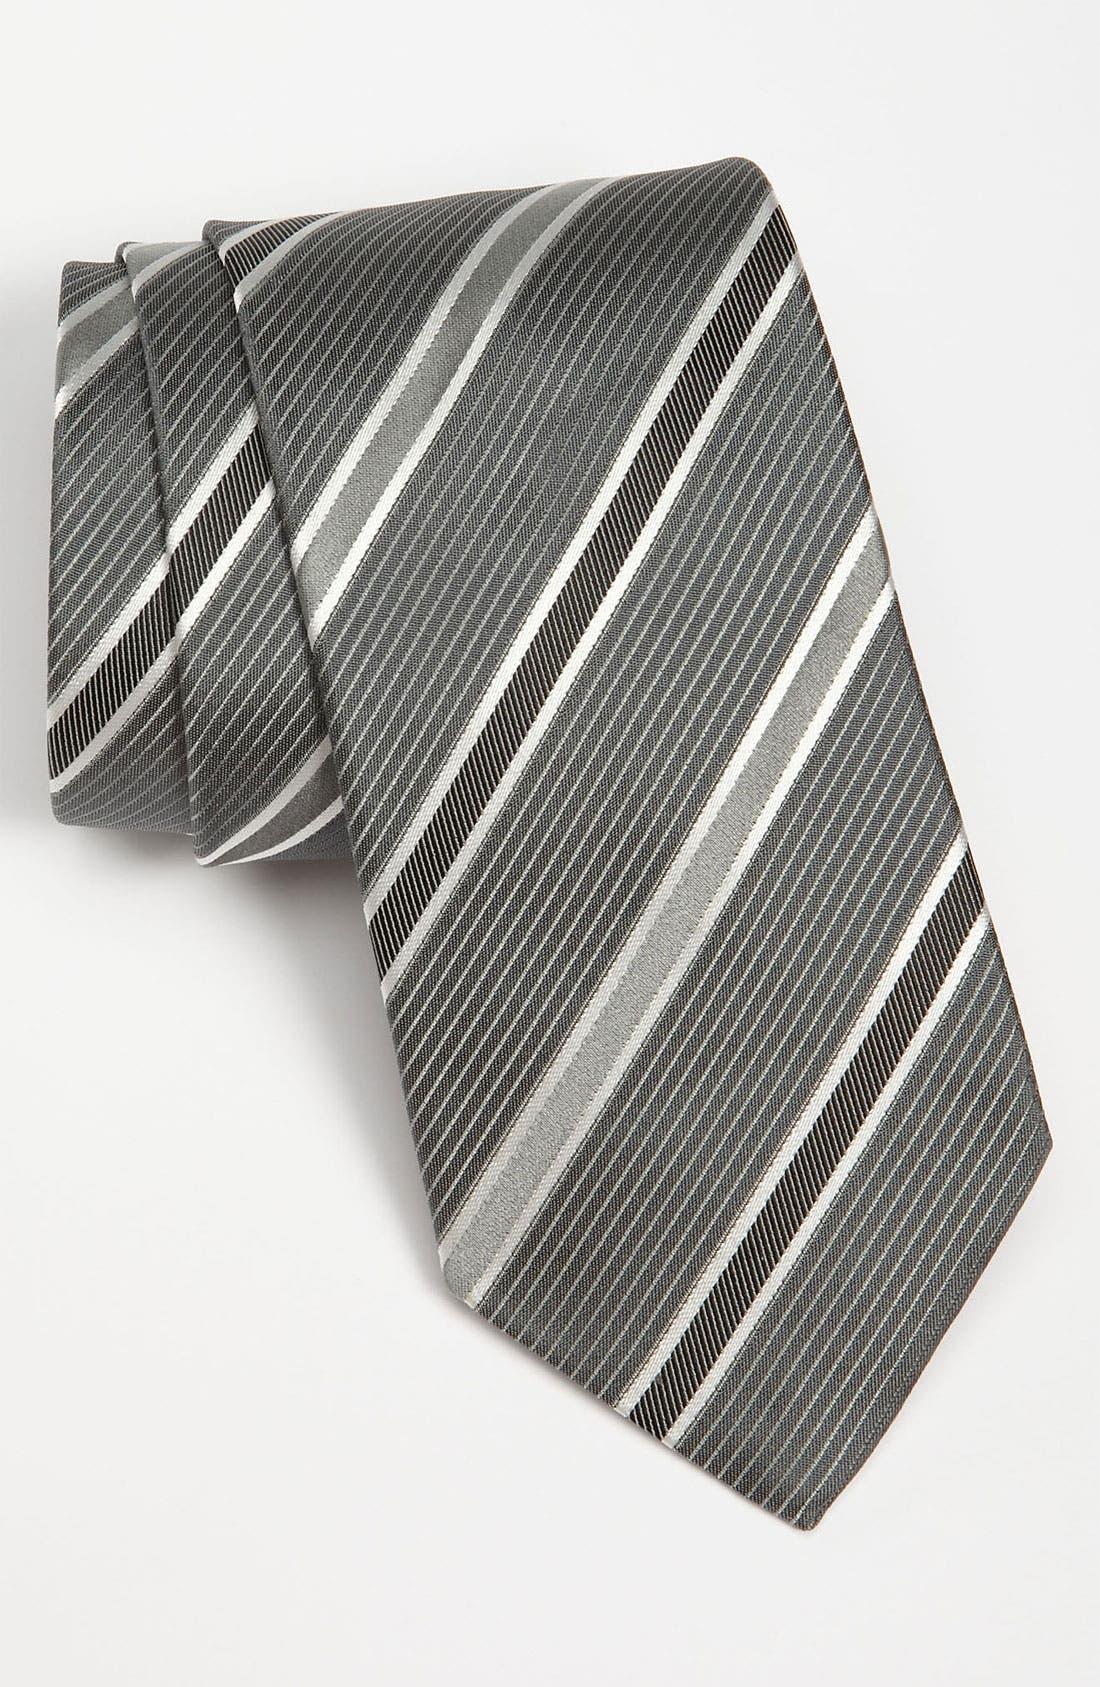 HUGO BOSS Woven Silk Tie,                         Main,                         color, 032